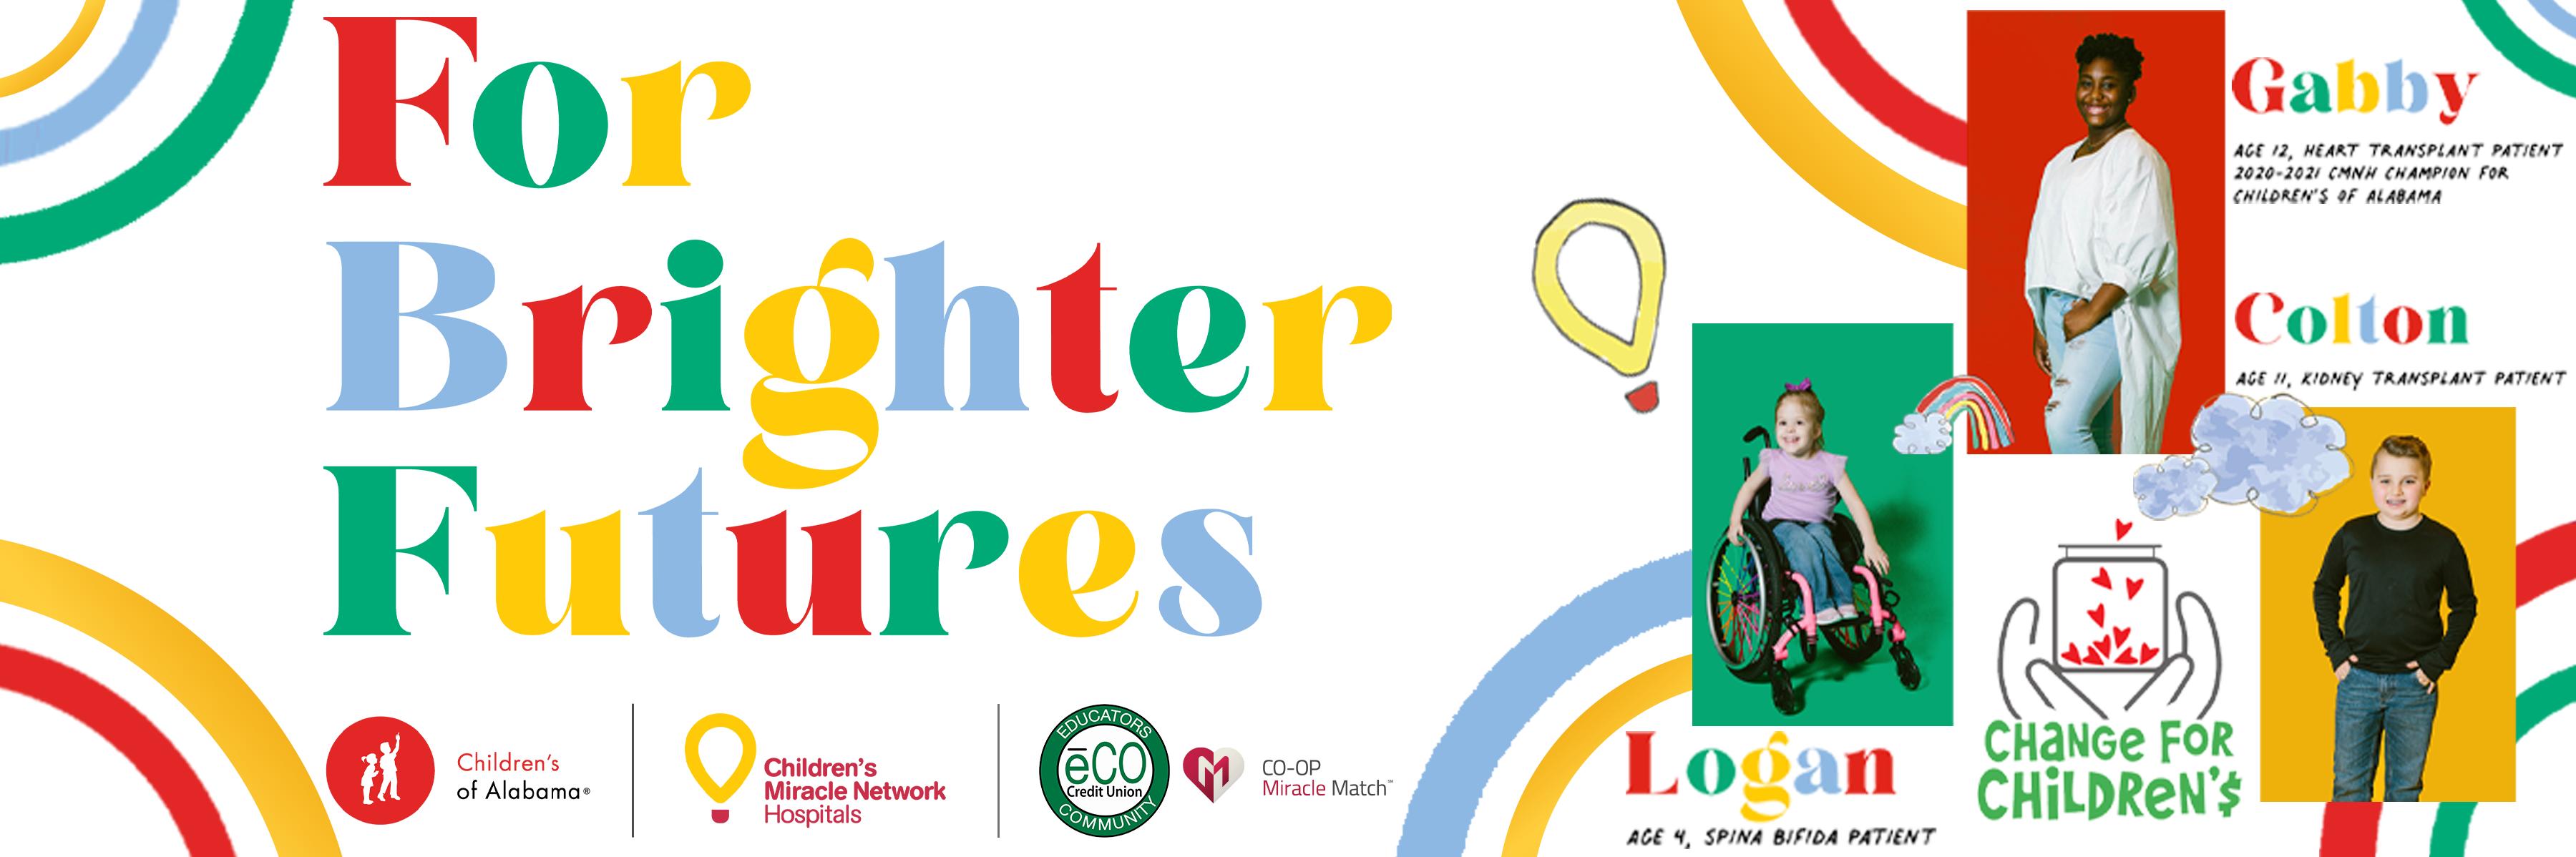 eCO Credit Union Change for Children's Campaign